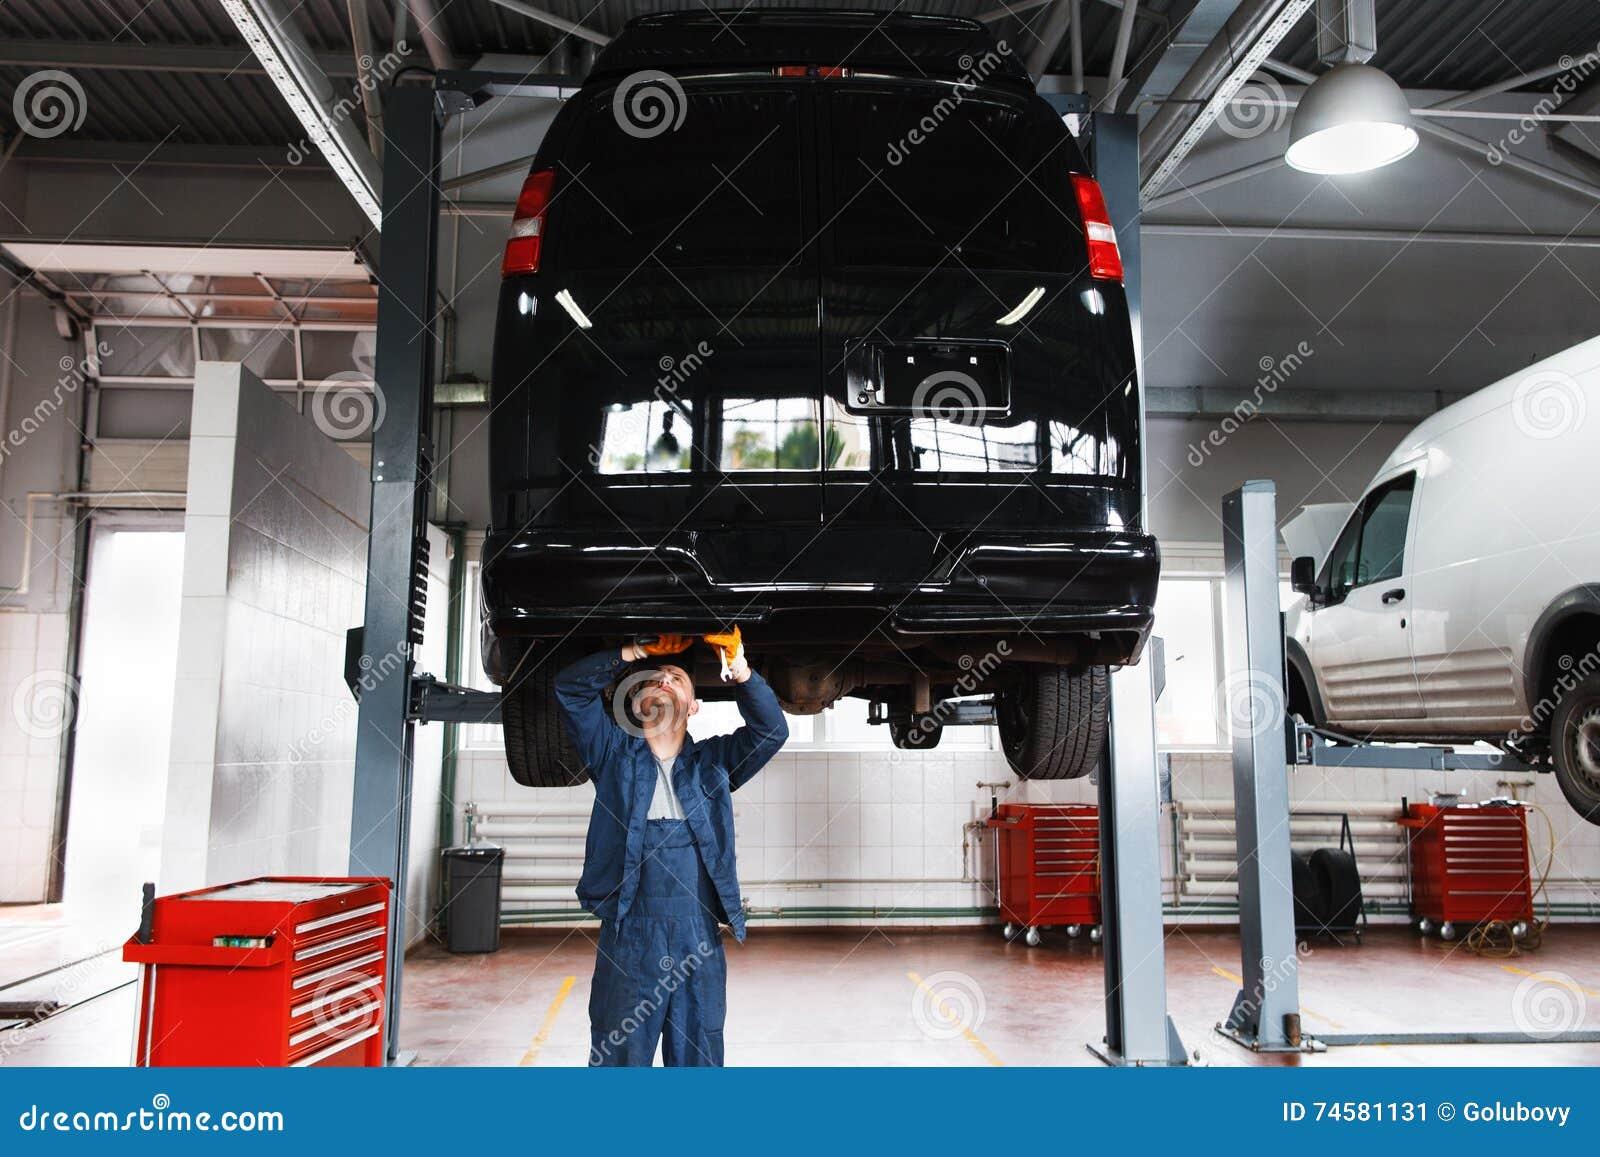 Car interior maintenance - Minibus Service Maintenance Garage Interior